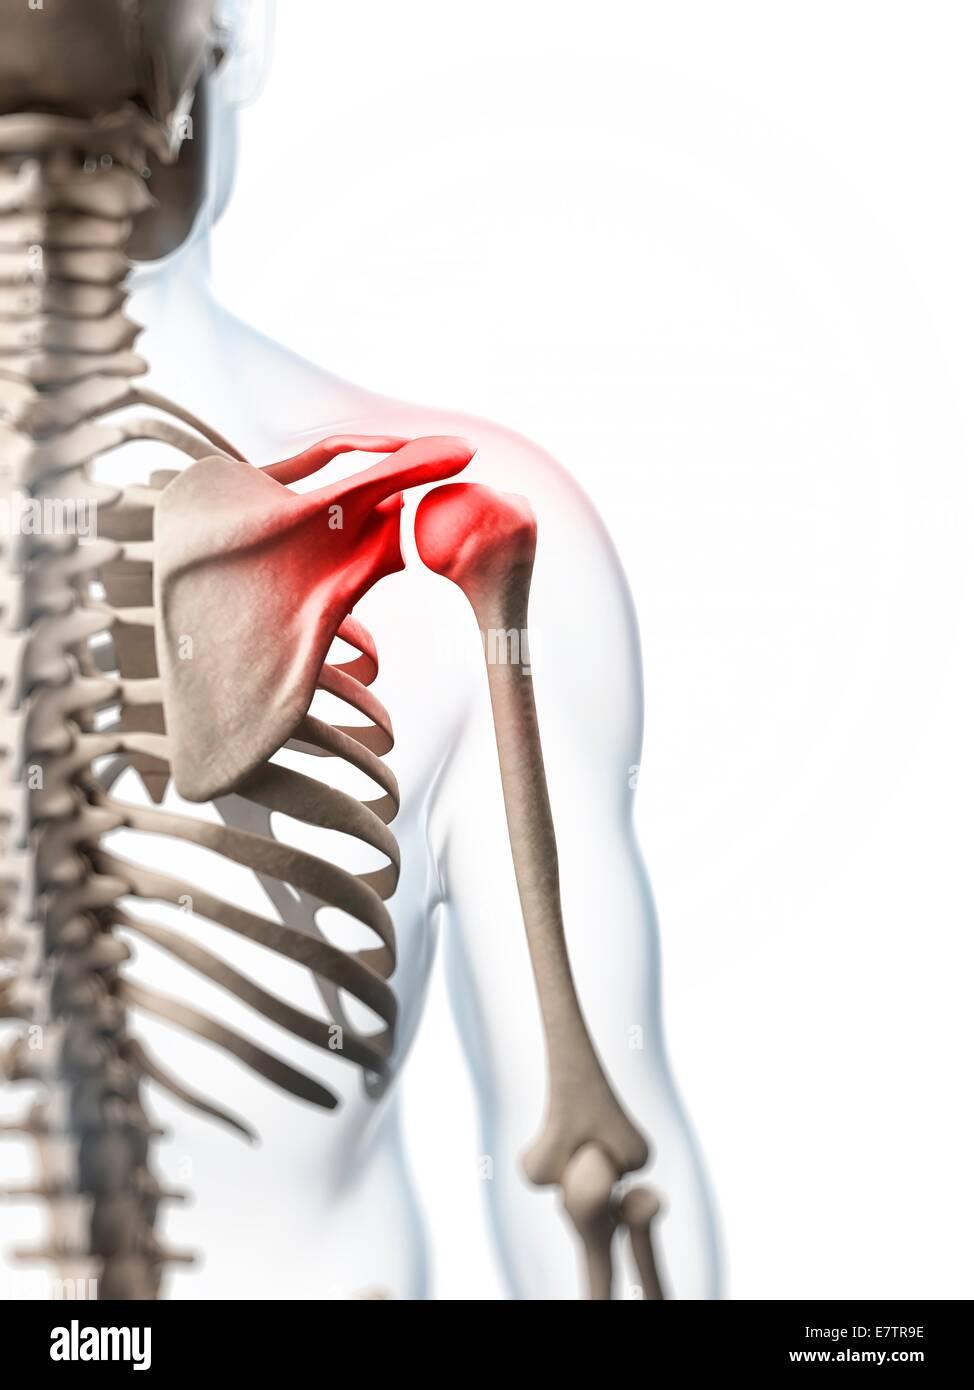 Human shoulder pain, computer artwork Stock Photo: 73689210 - Alamy